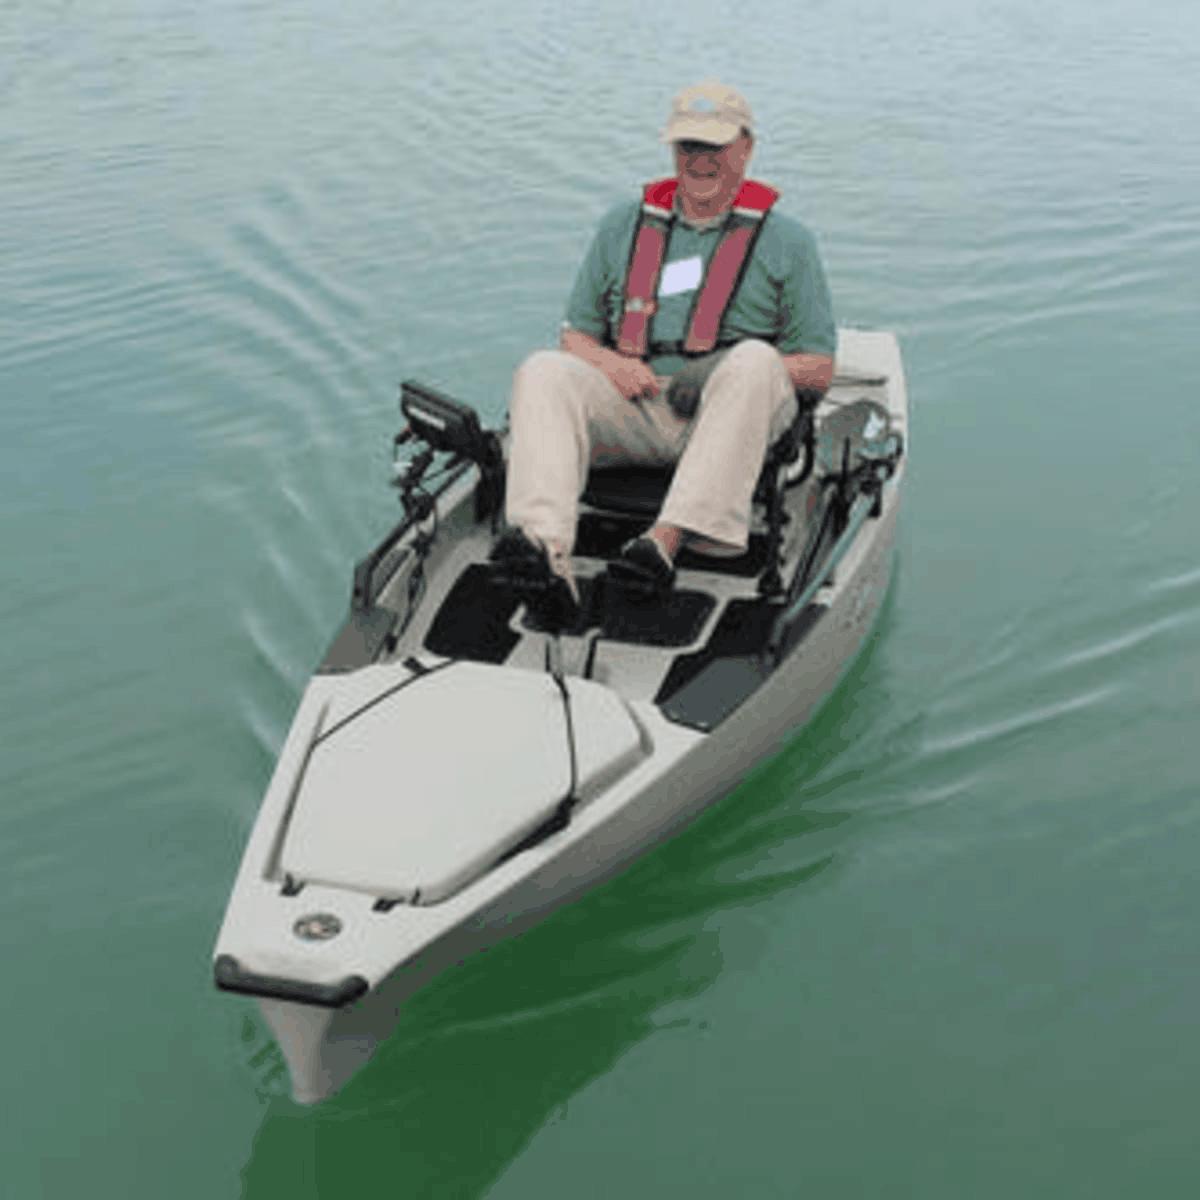 bigger fish finder for pedal driven kayaks